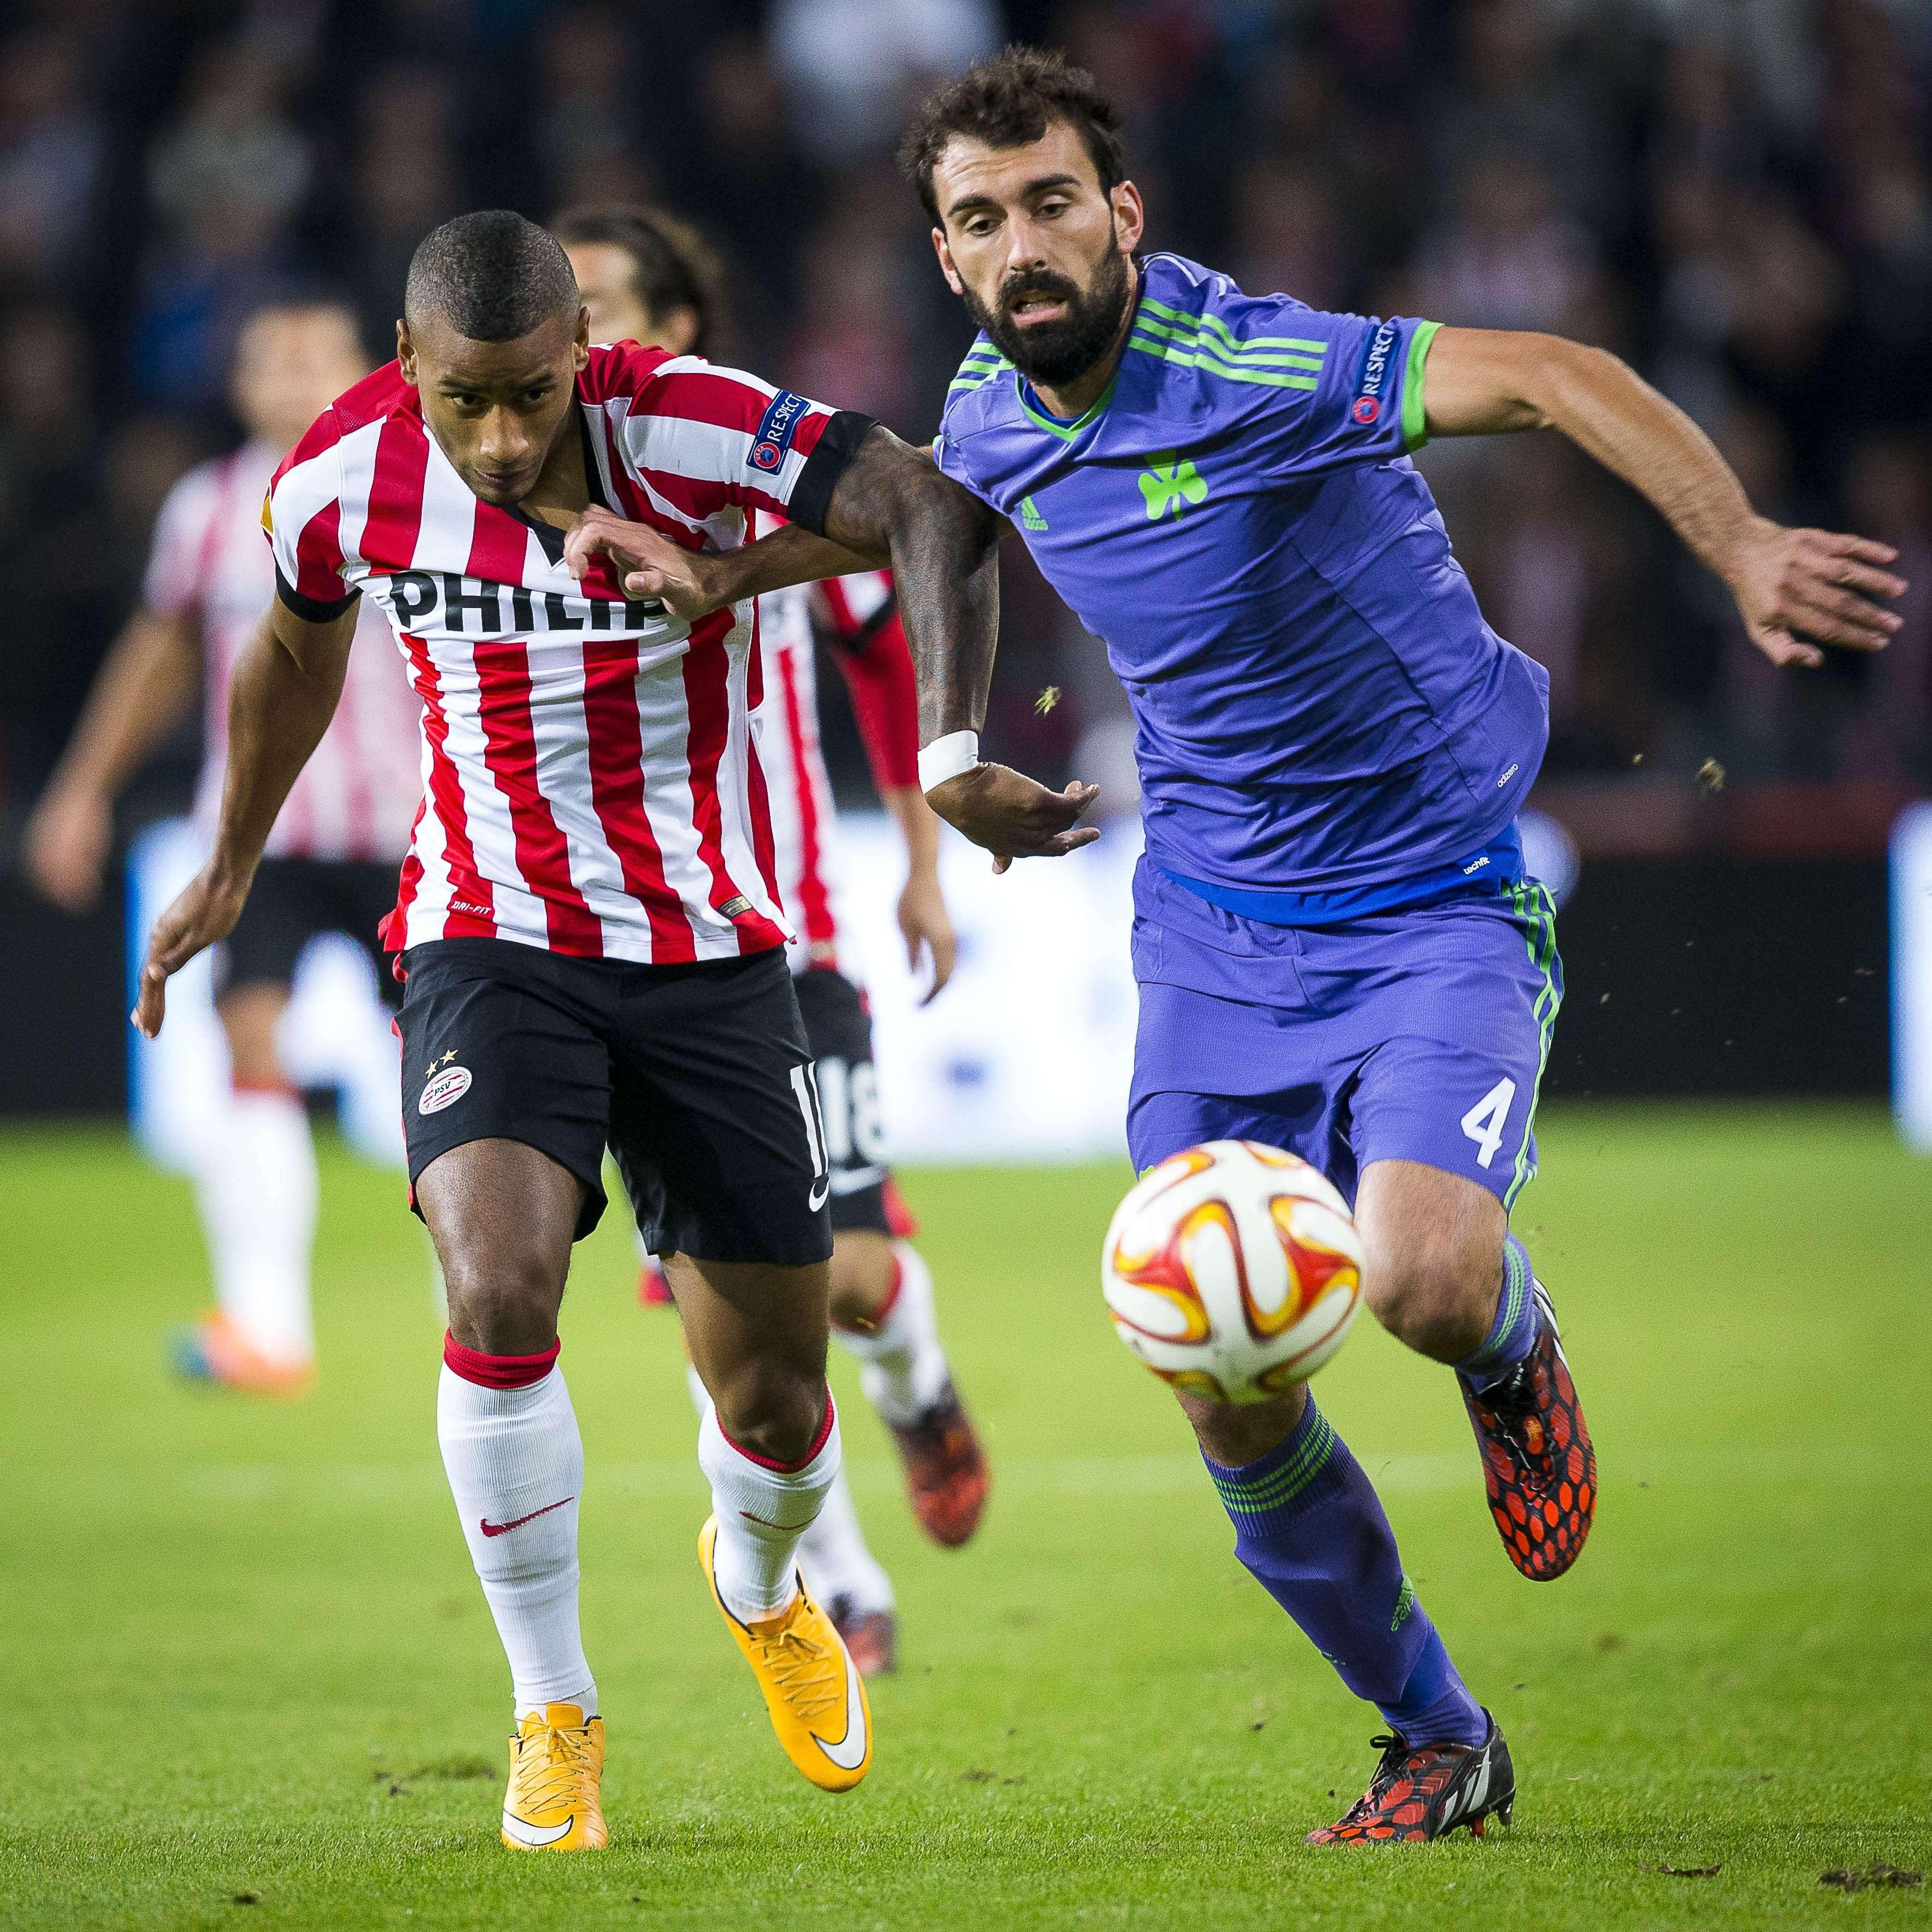 Panathinaikos y PSV repartieron puntos. Foto: AFP